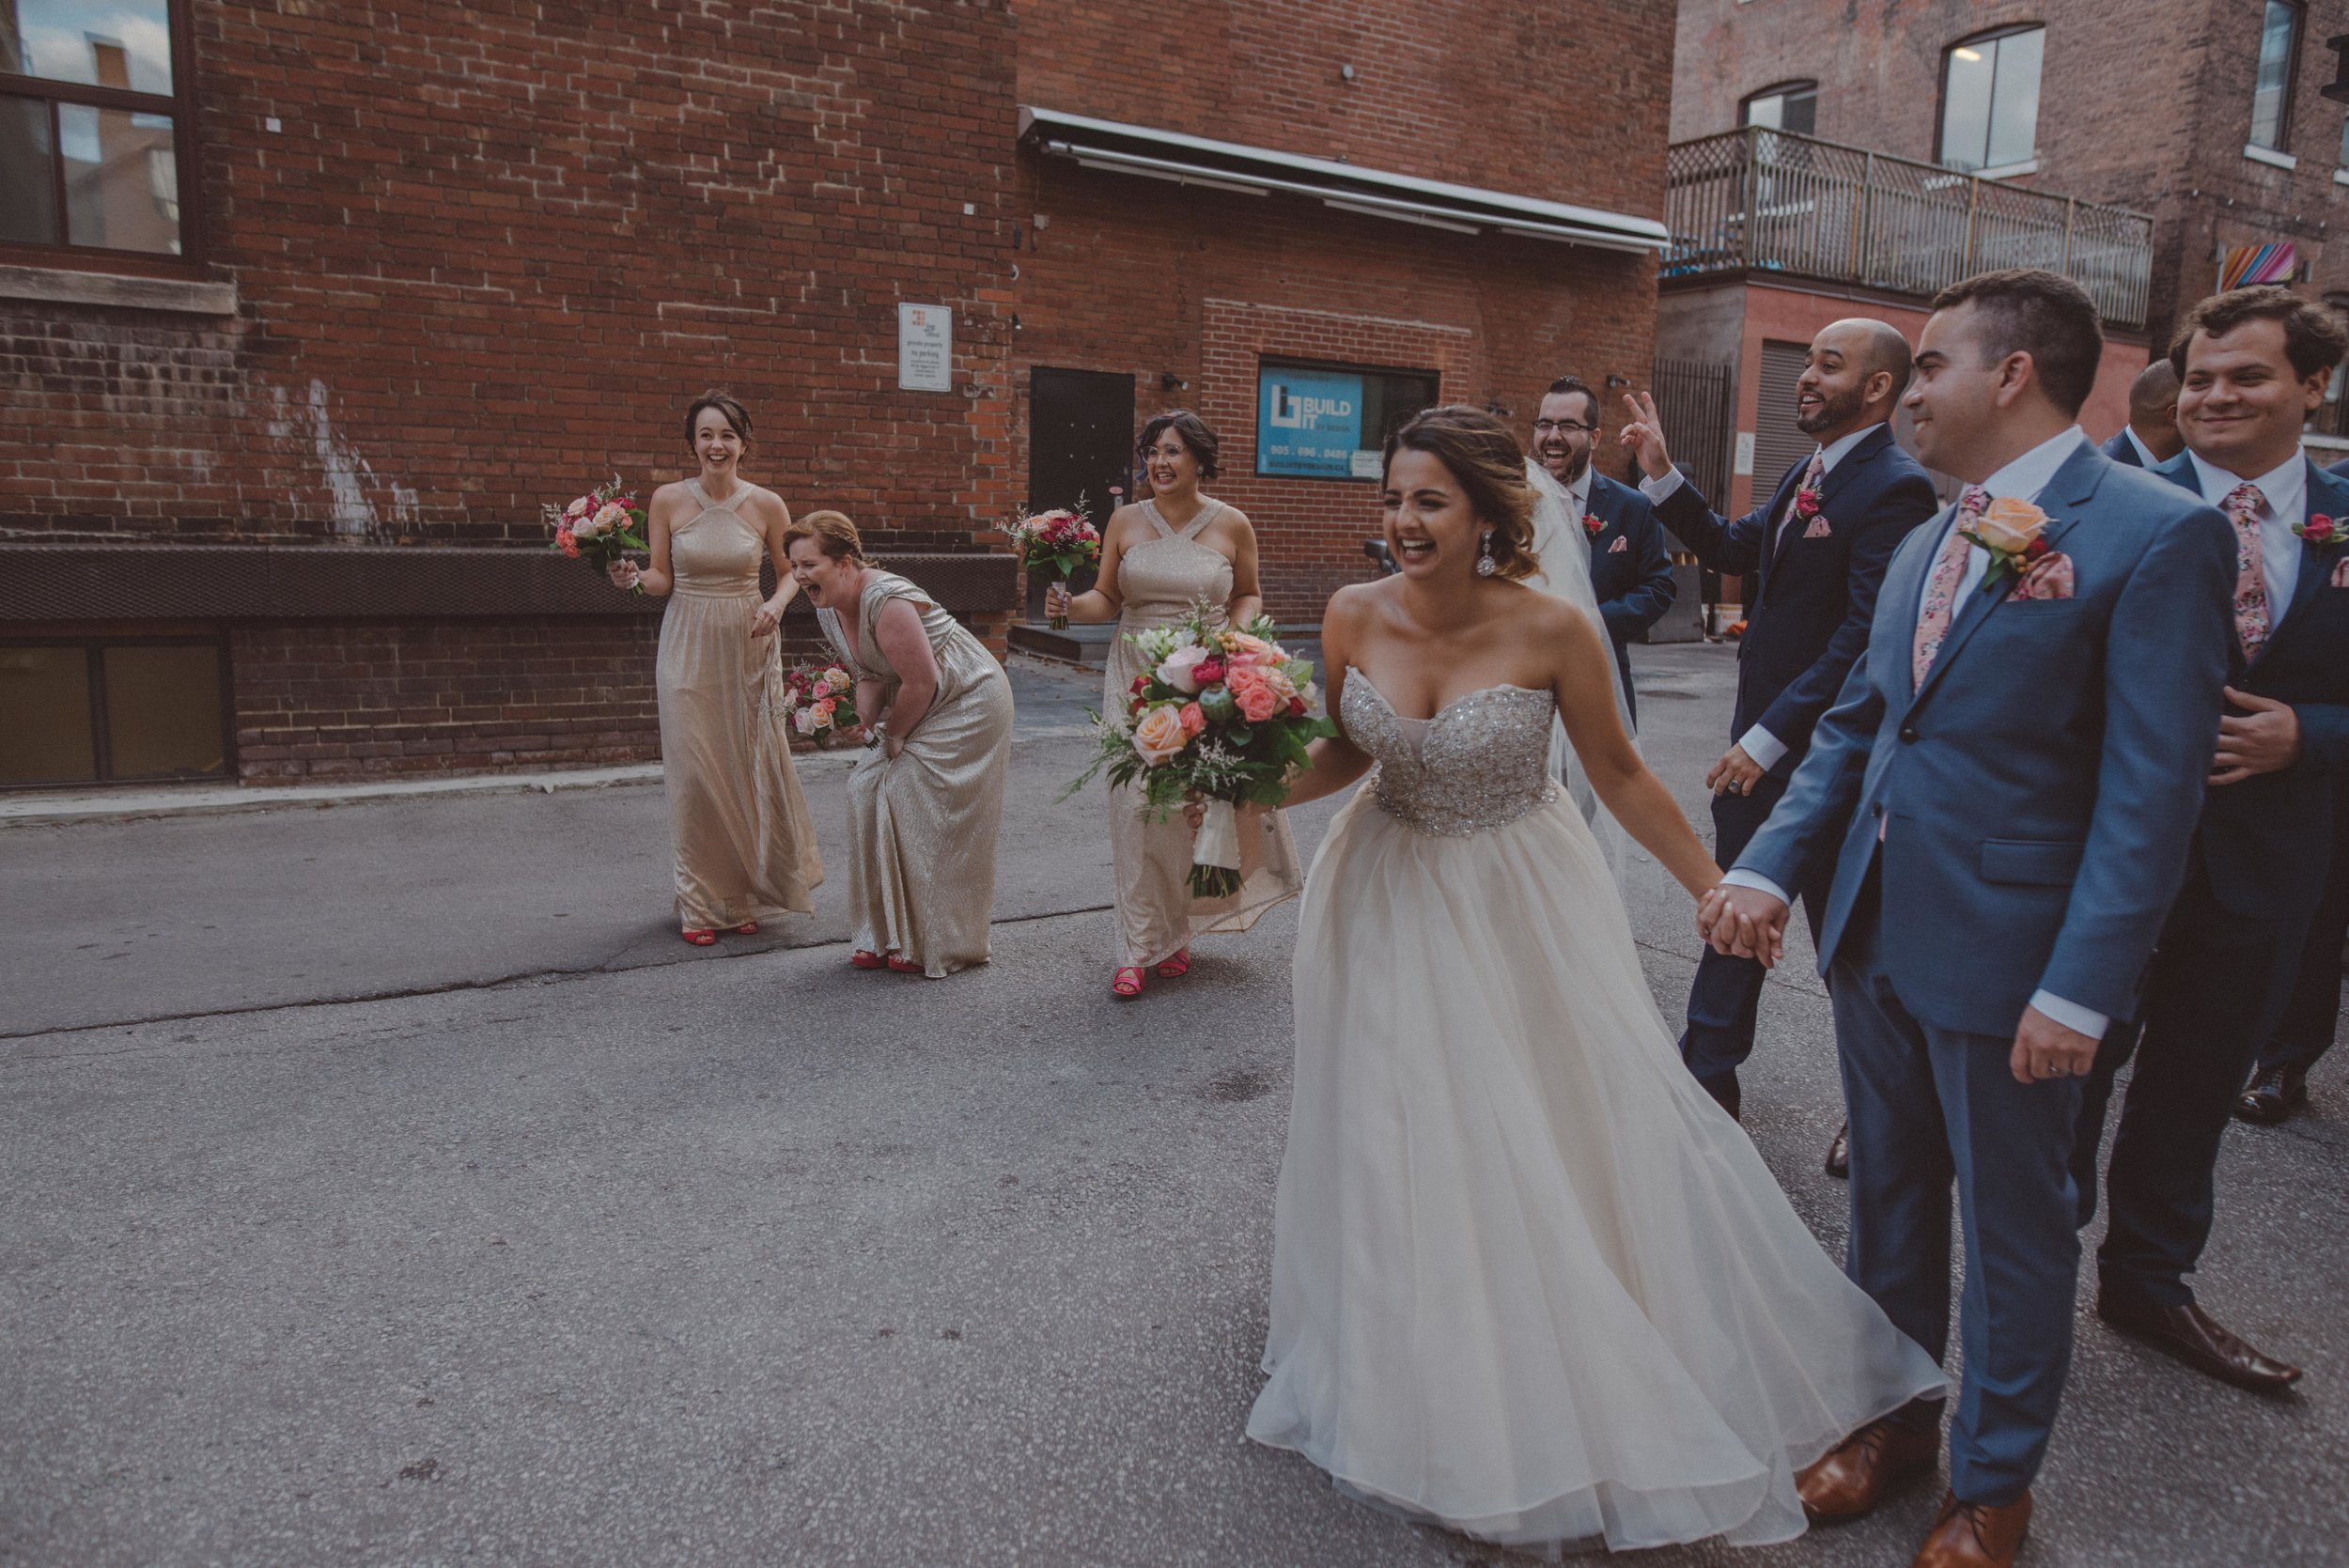 mariage_photographe_toronto_gatineau_ottawa_photographer_wedding-31.jpg